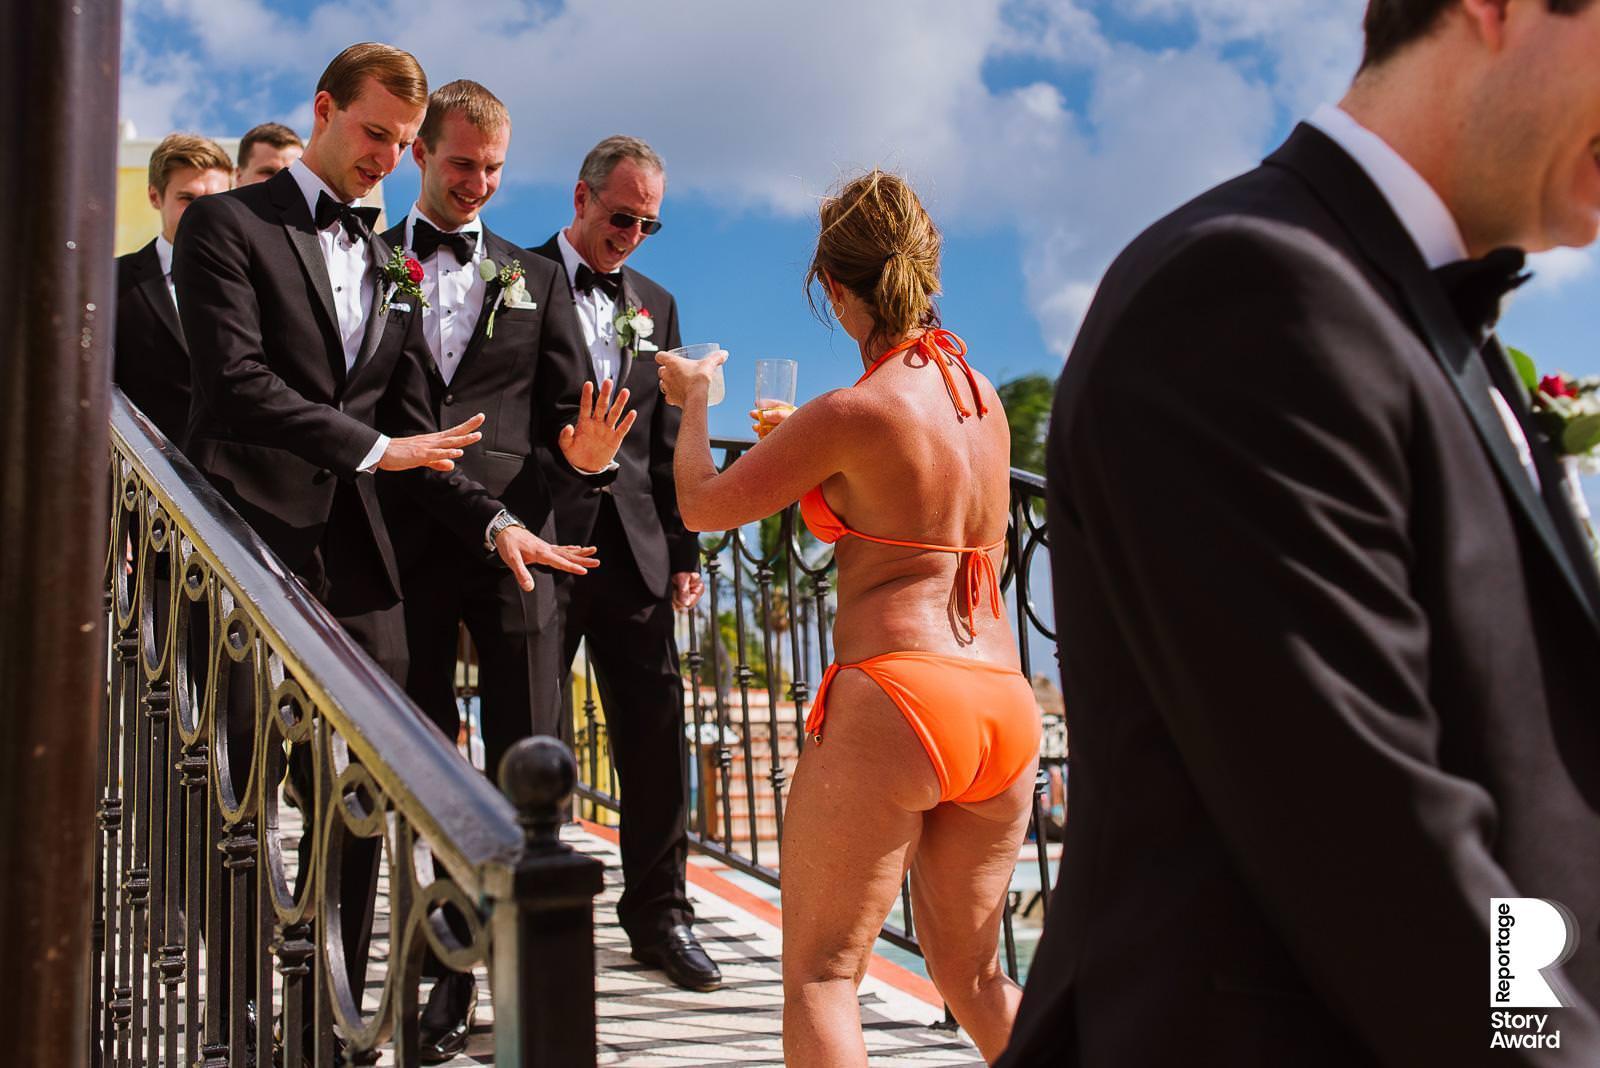 Tourist wearing an orange bikini offers a drink to a Groom wearing a tuxedo and he rejects it